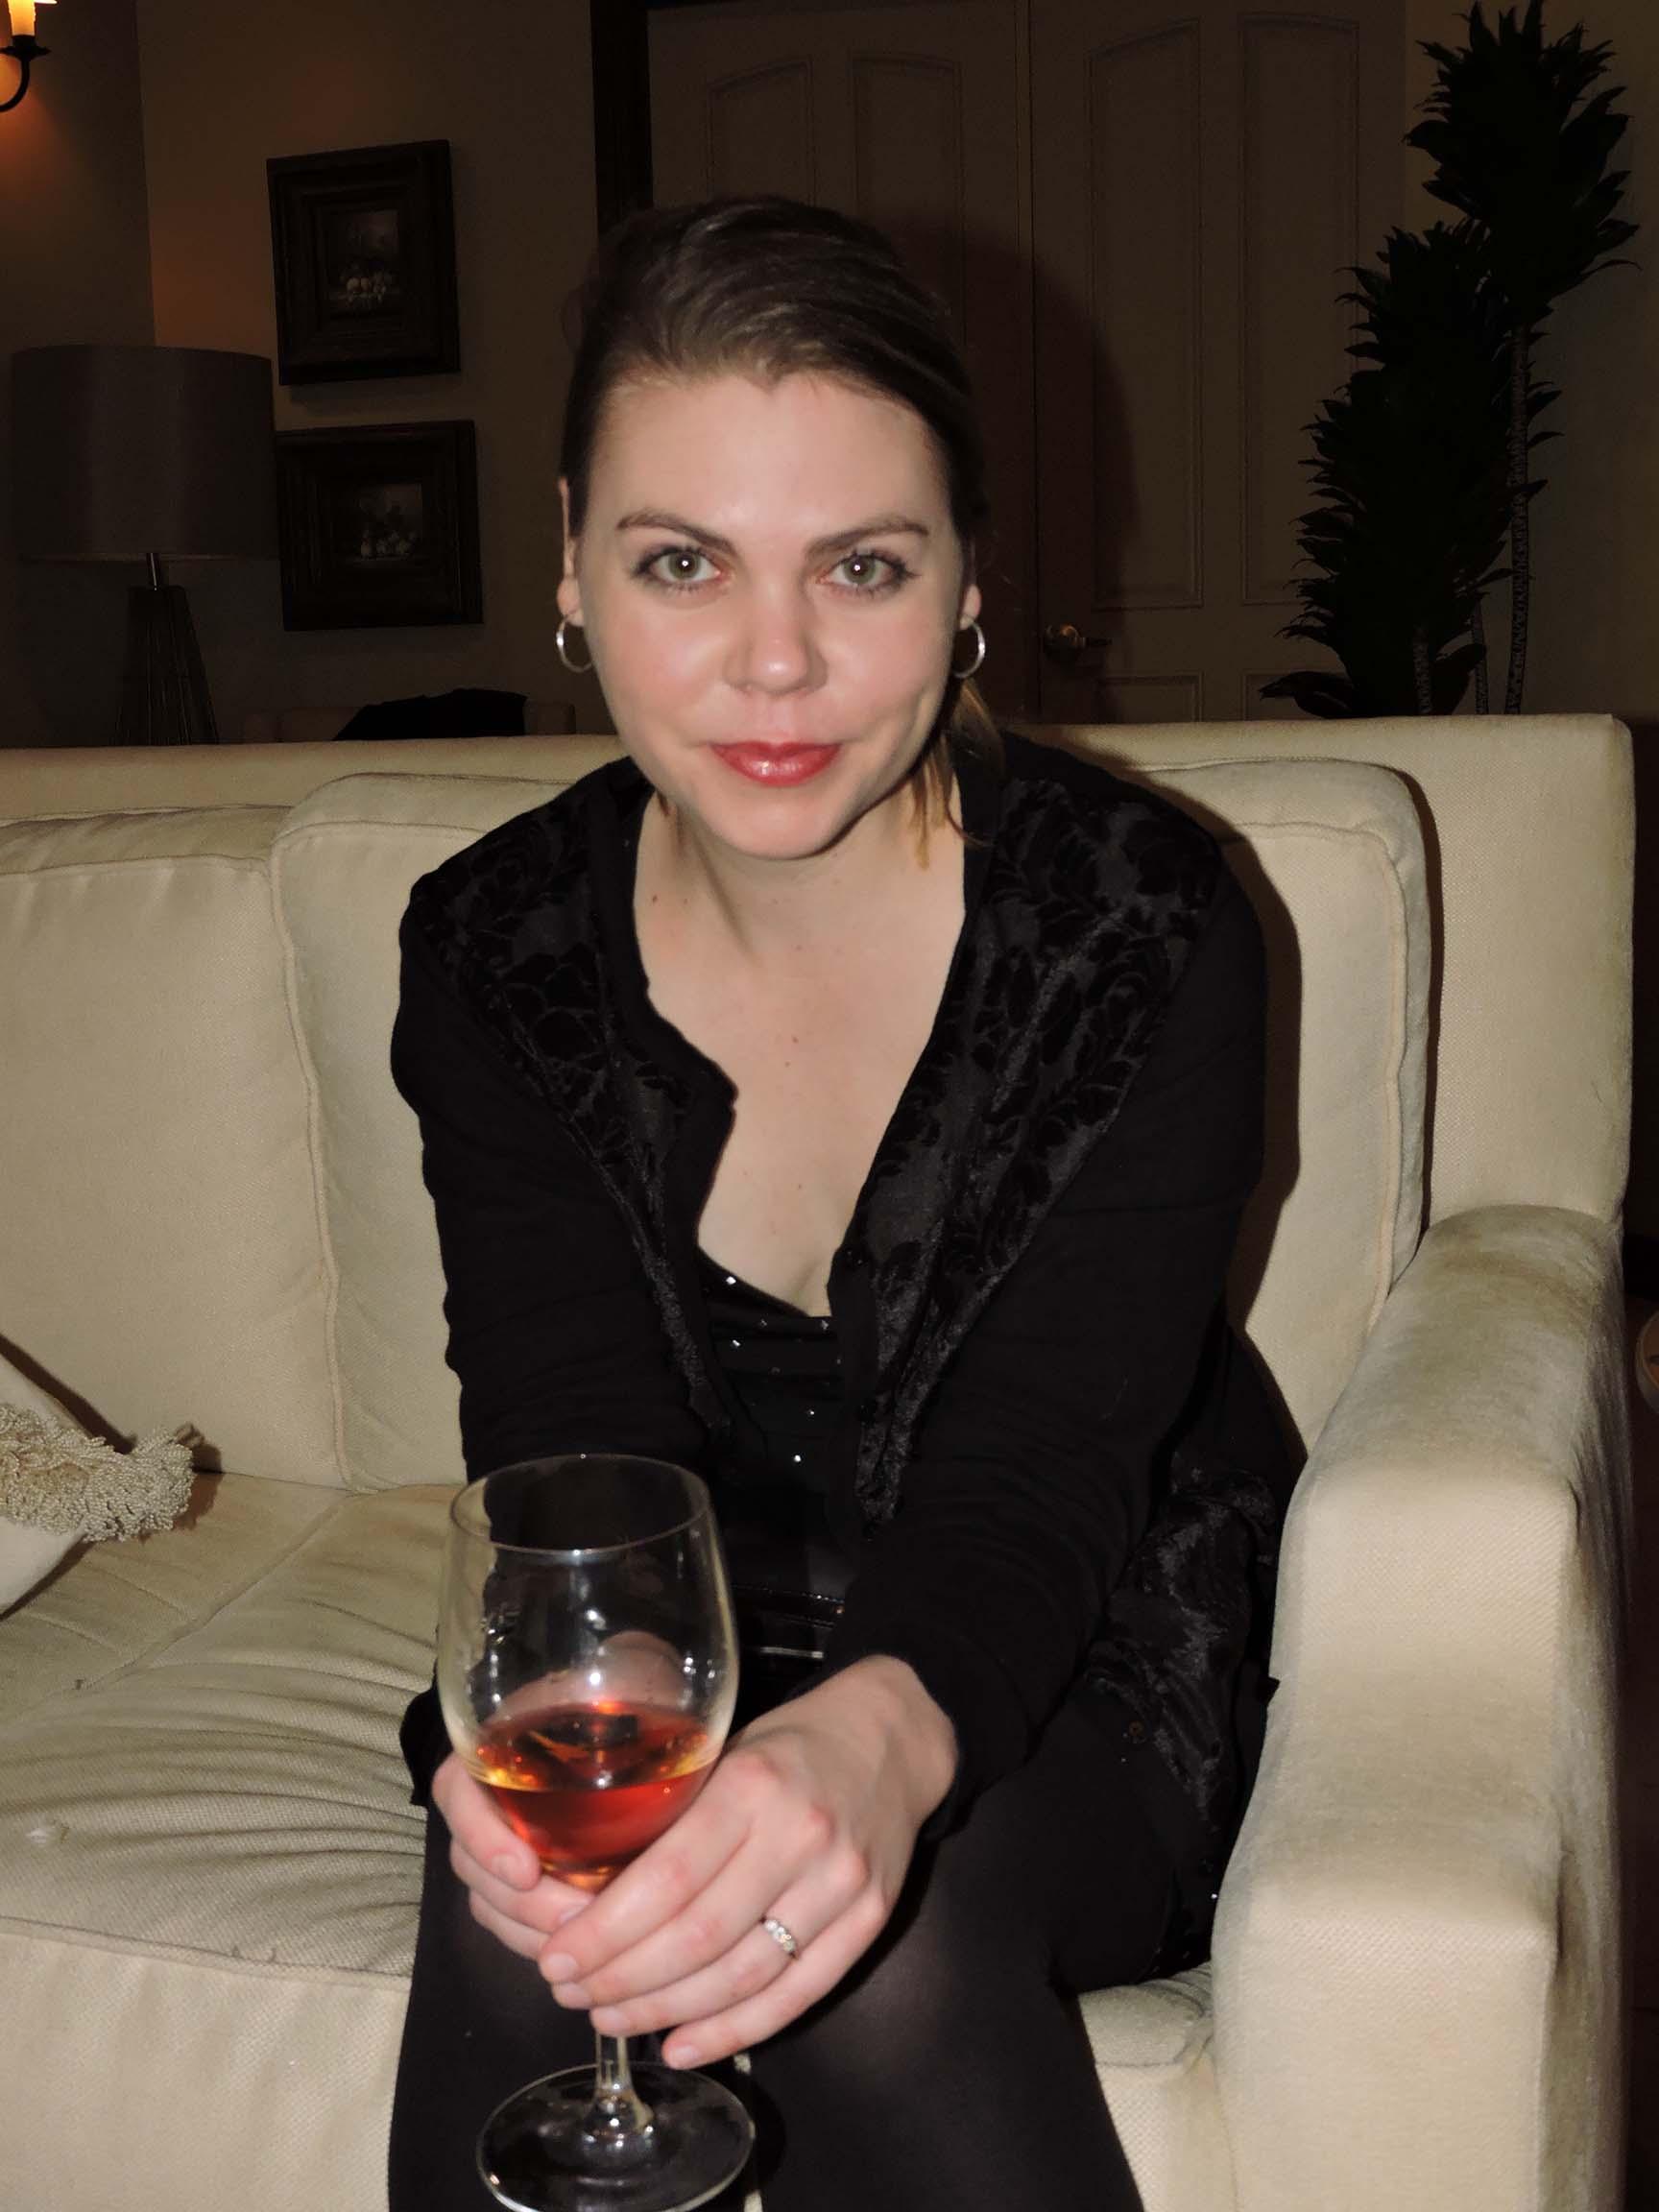 Sophie Miller-Chatfield